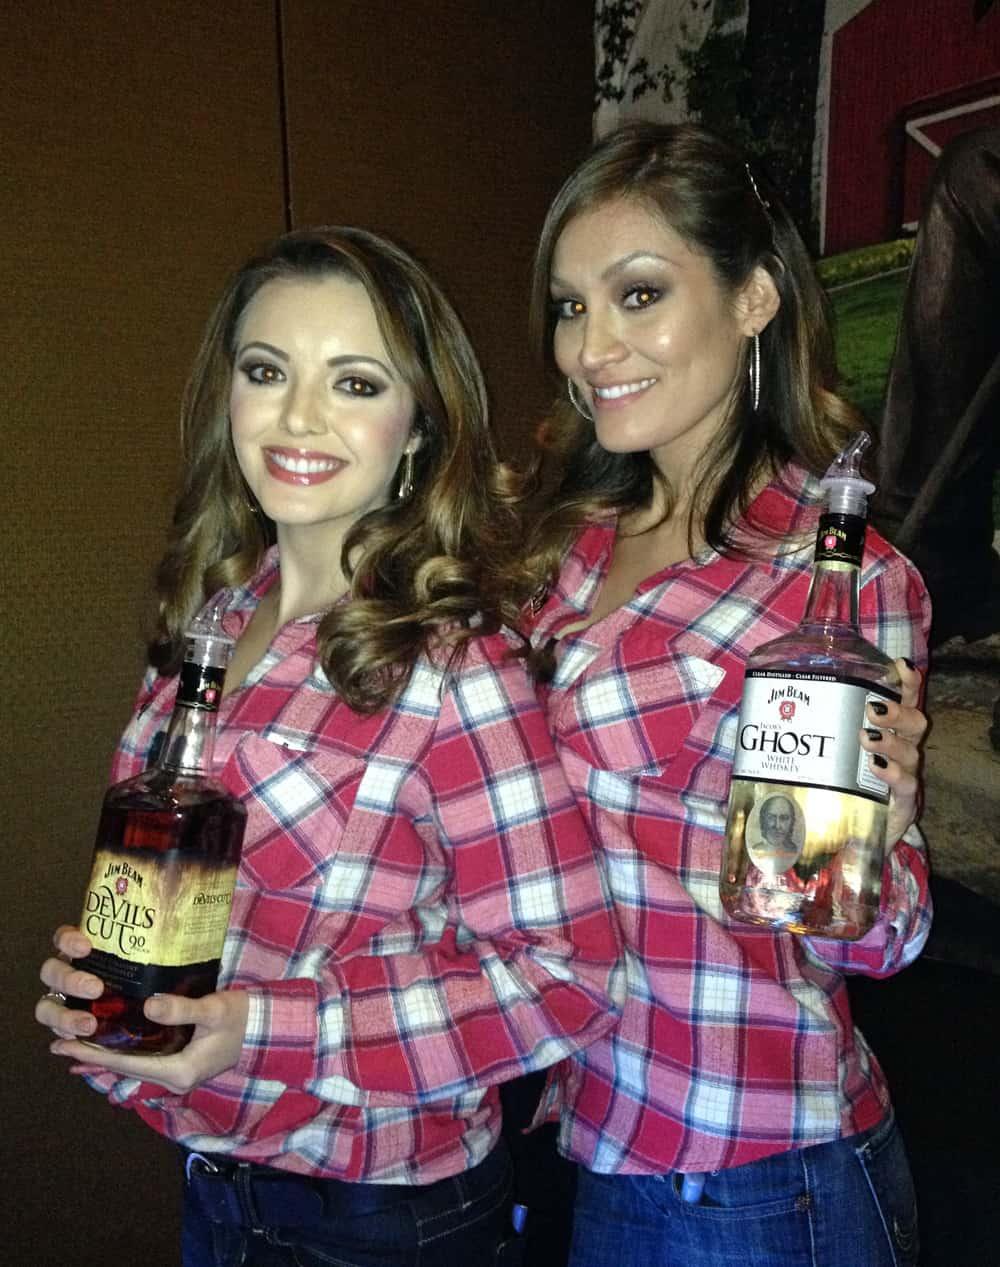 WhiskeyFest 2014 - Devils Cut / Ghost Babes, Las Vegas, NV